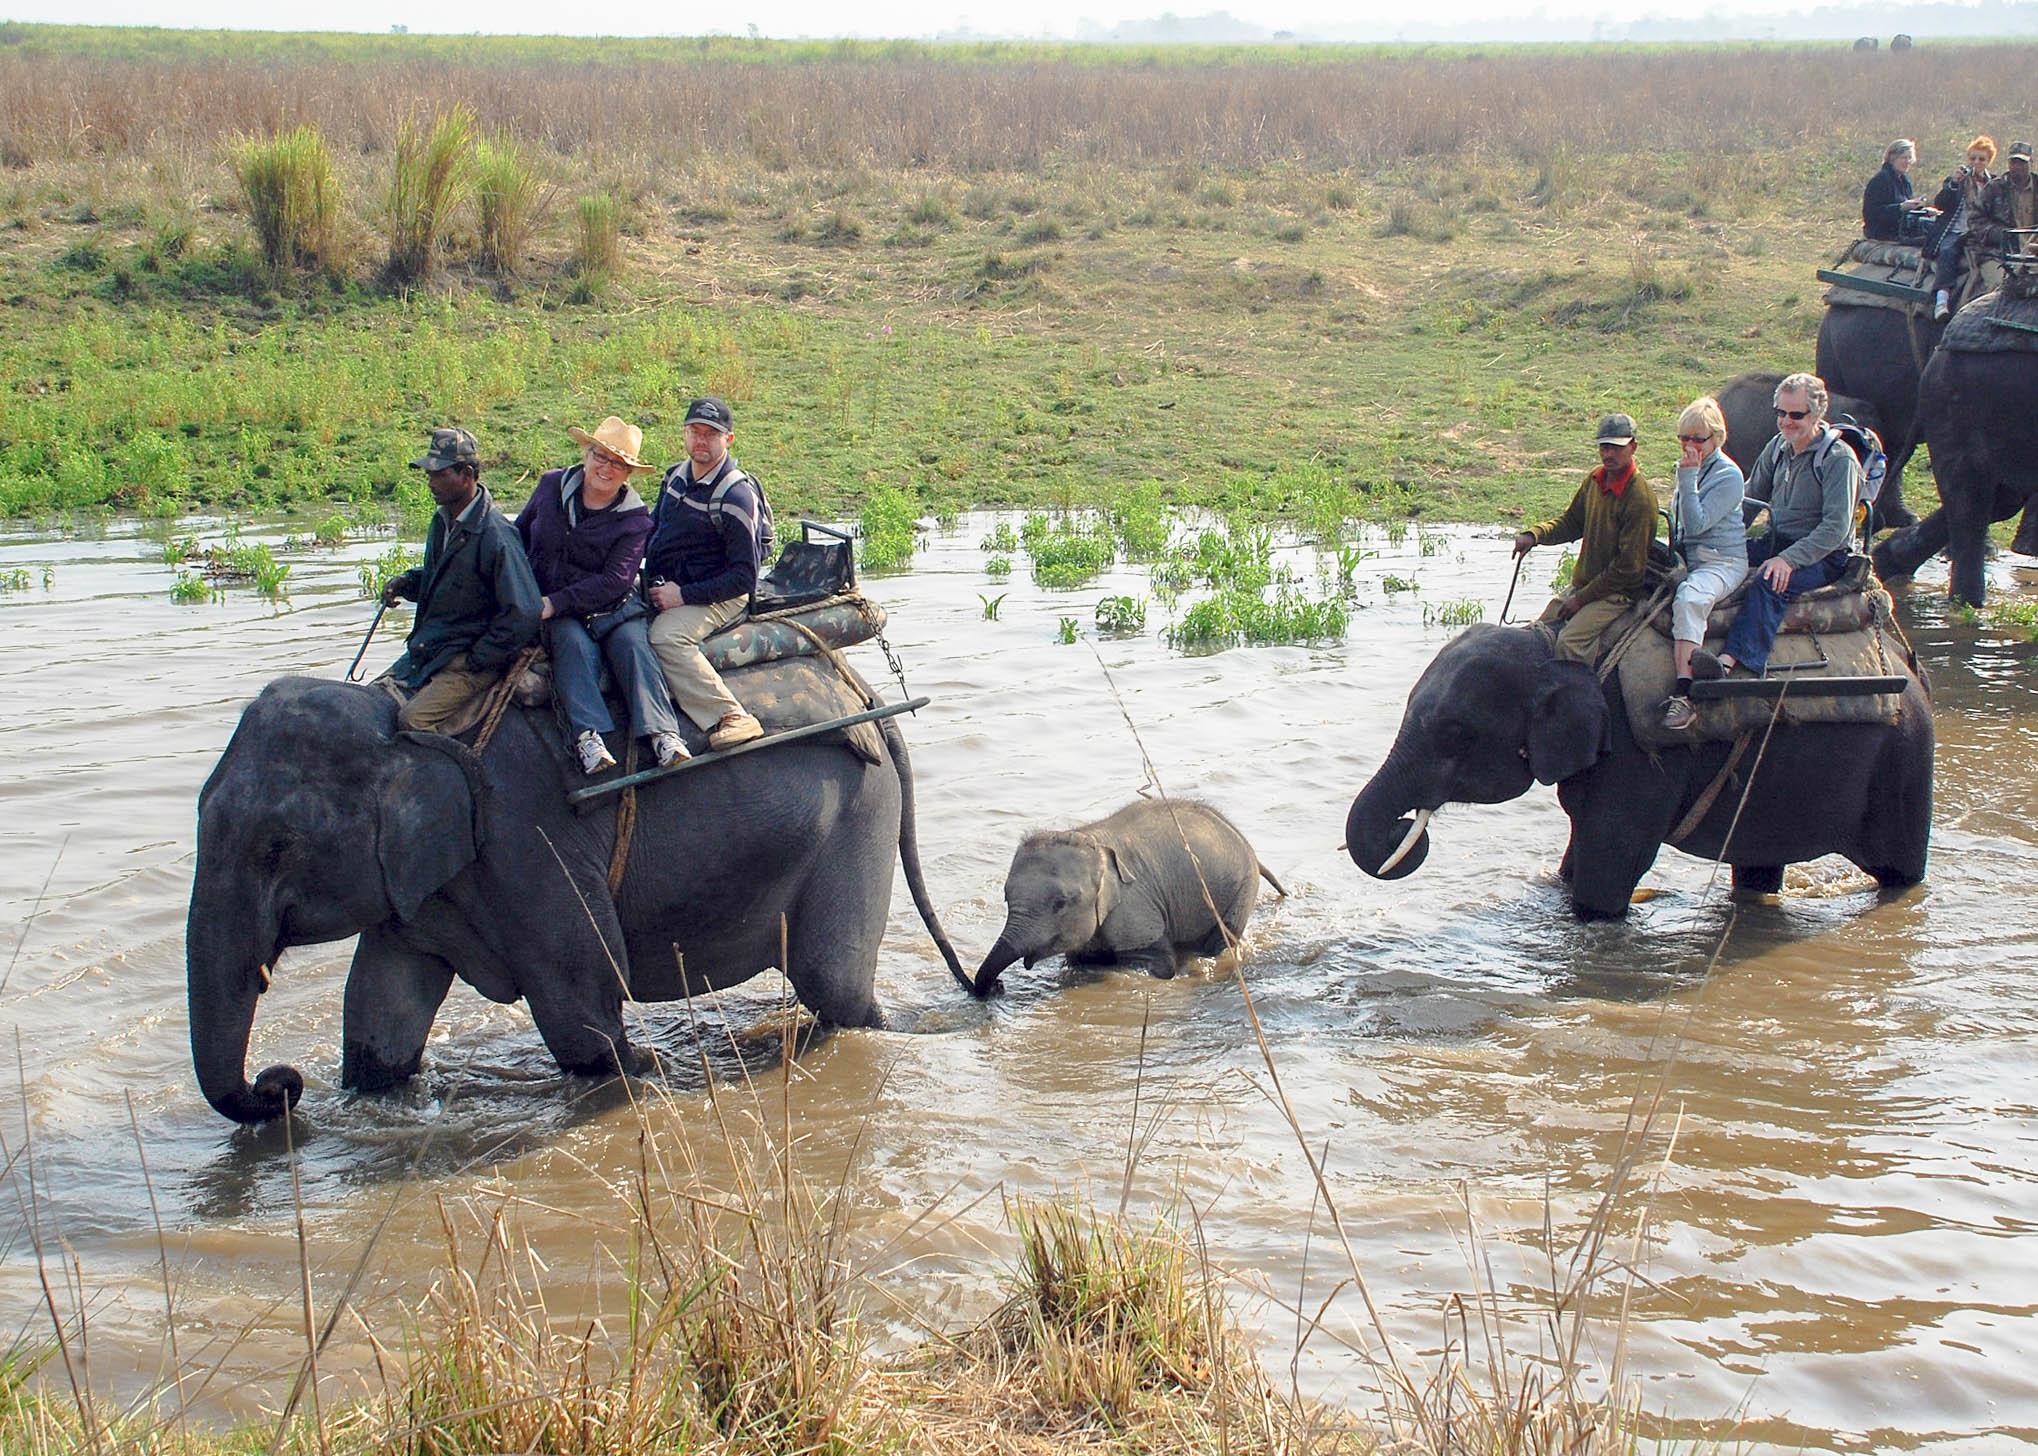 Elephant+Ride.jpg